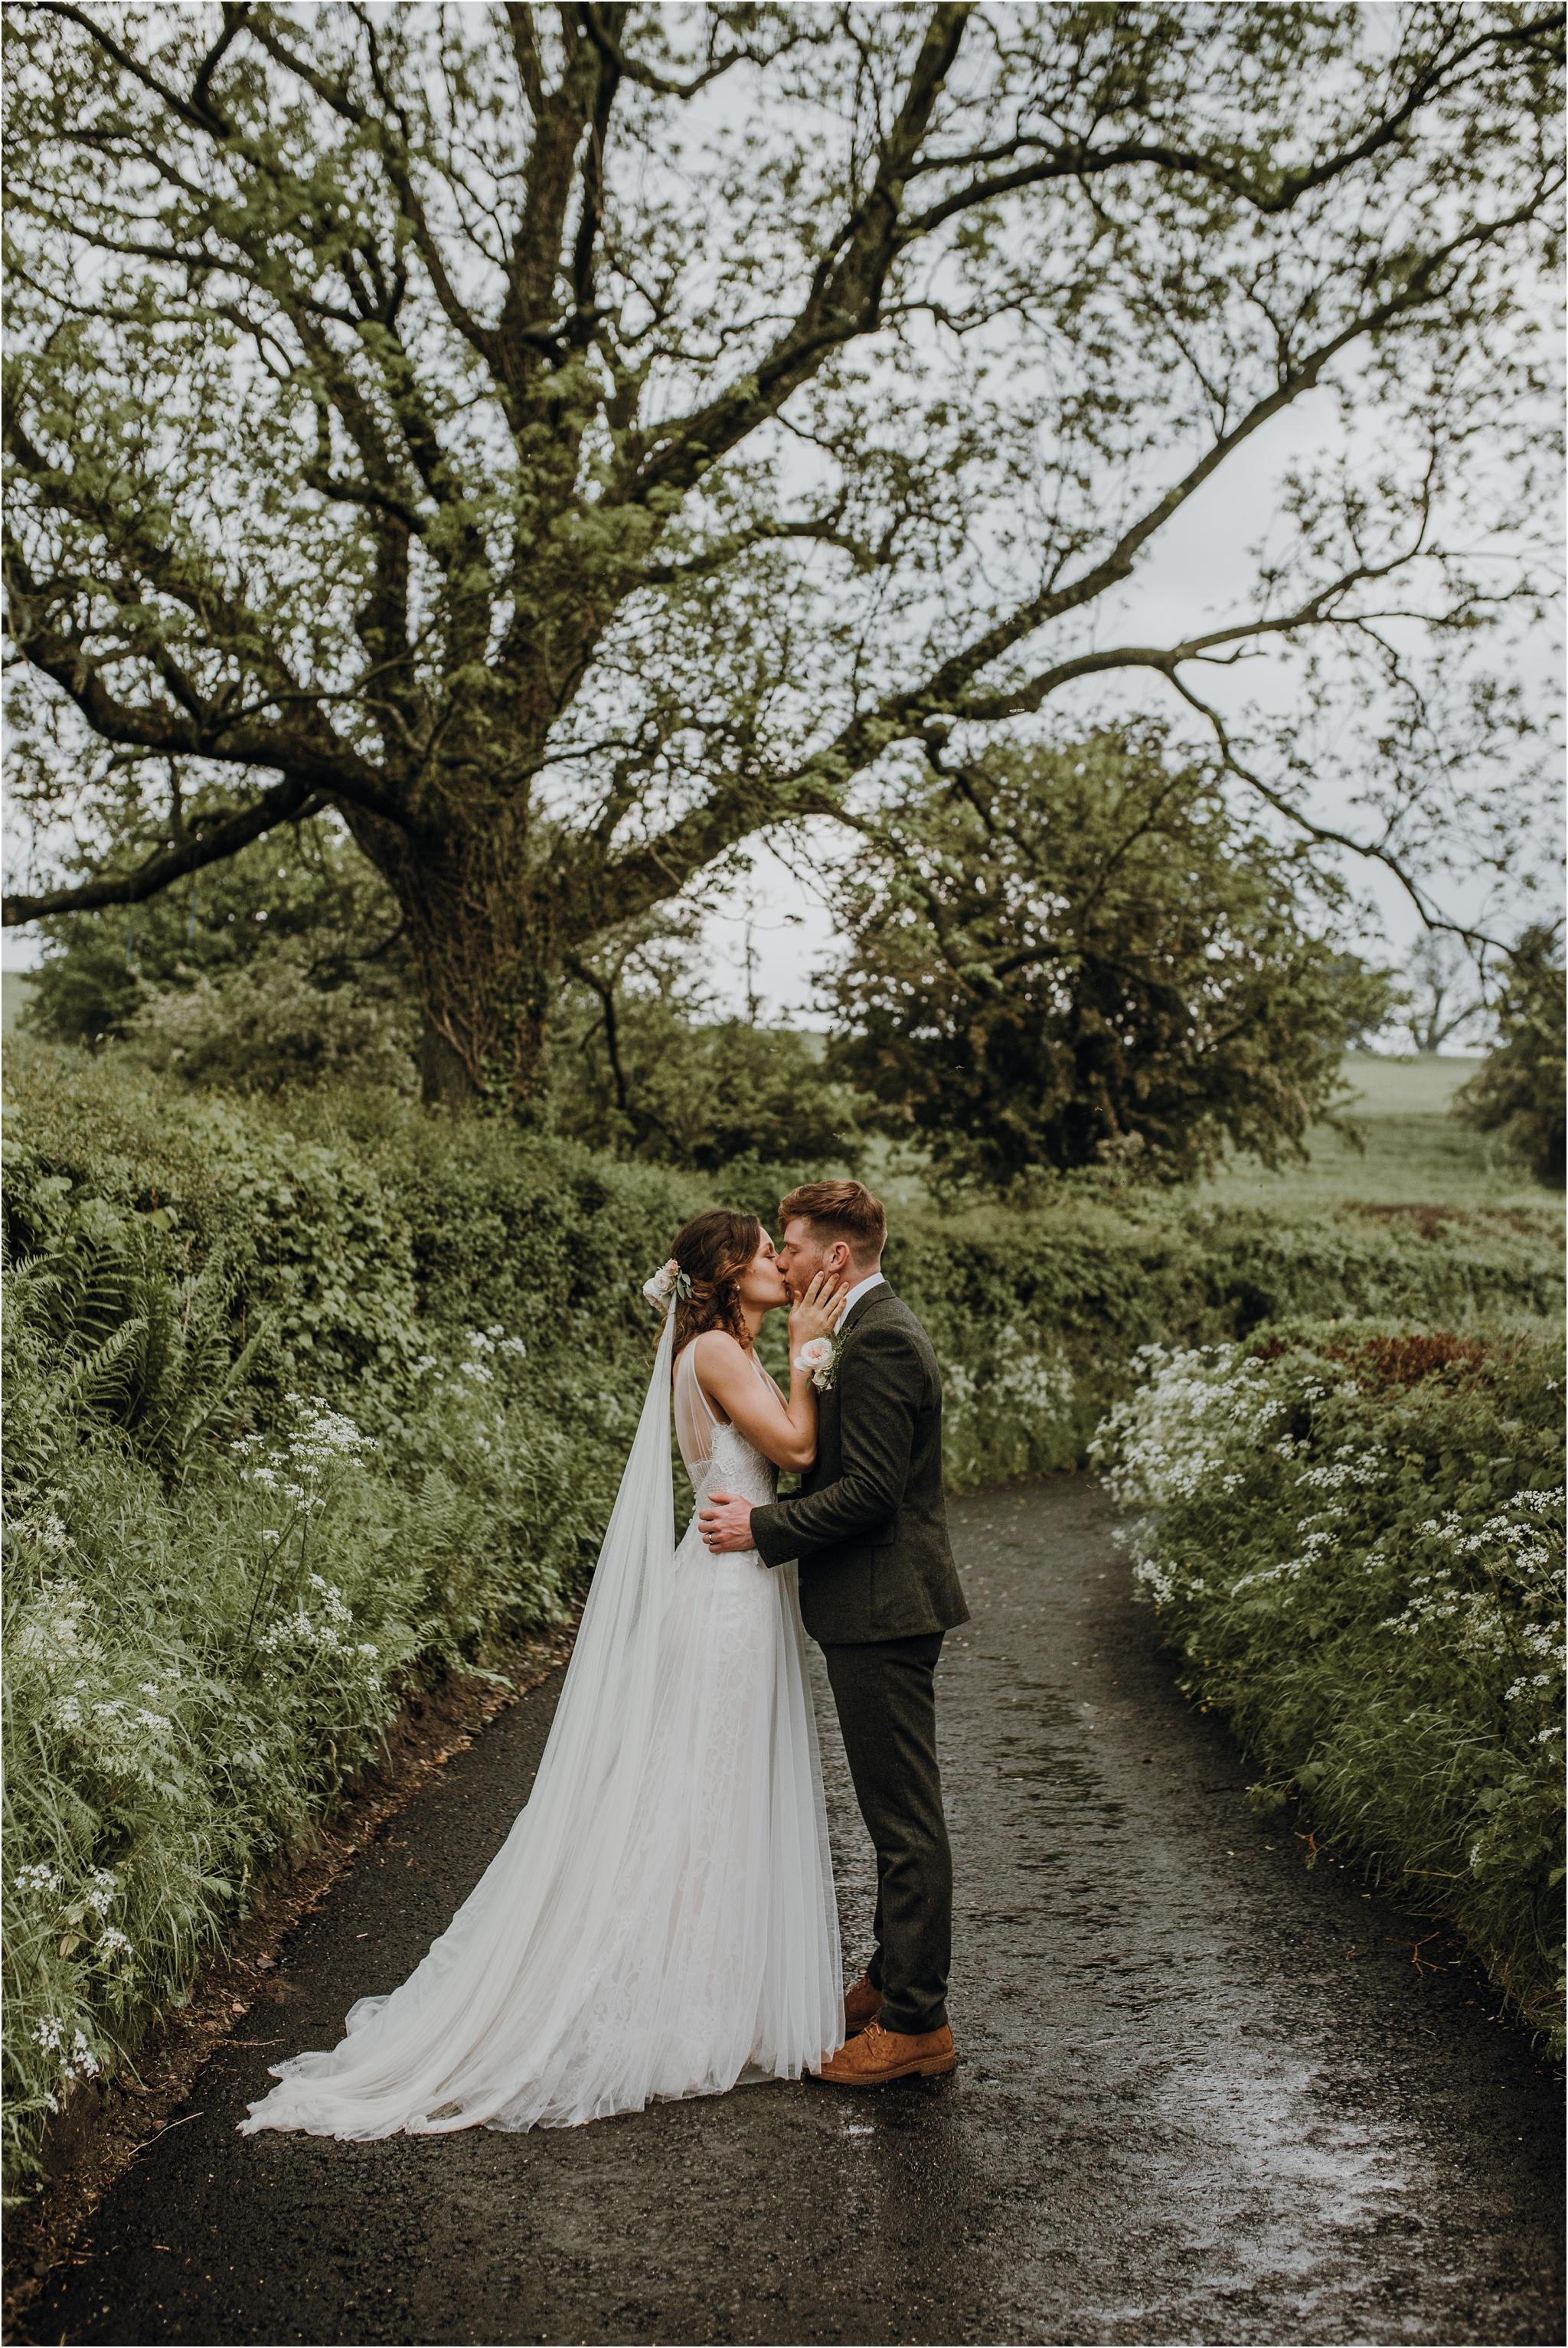 Outdoor-country-wedding-Edinburgh-photographer__0207.jpg